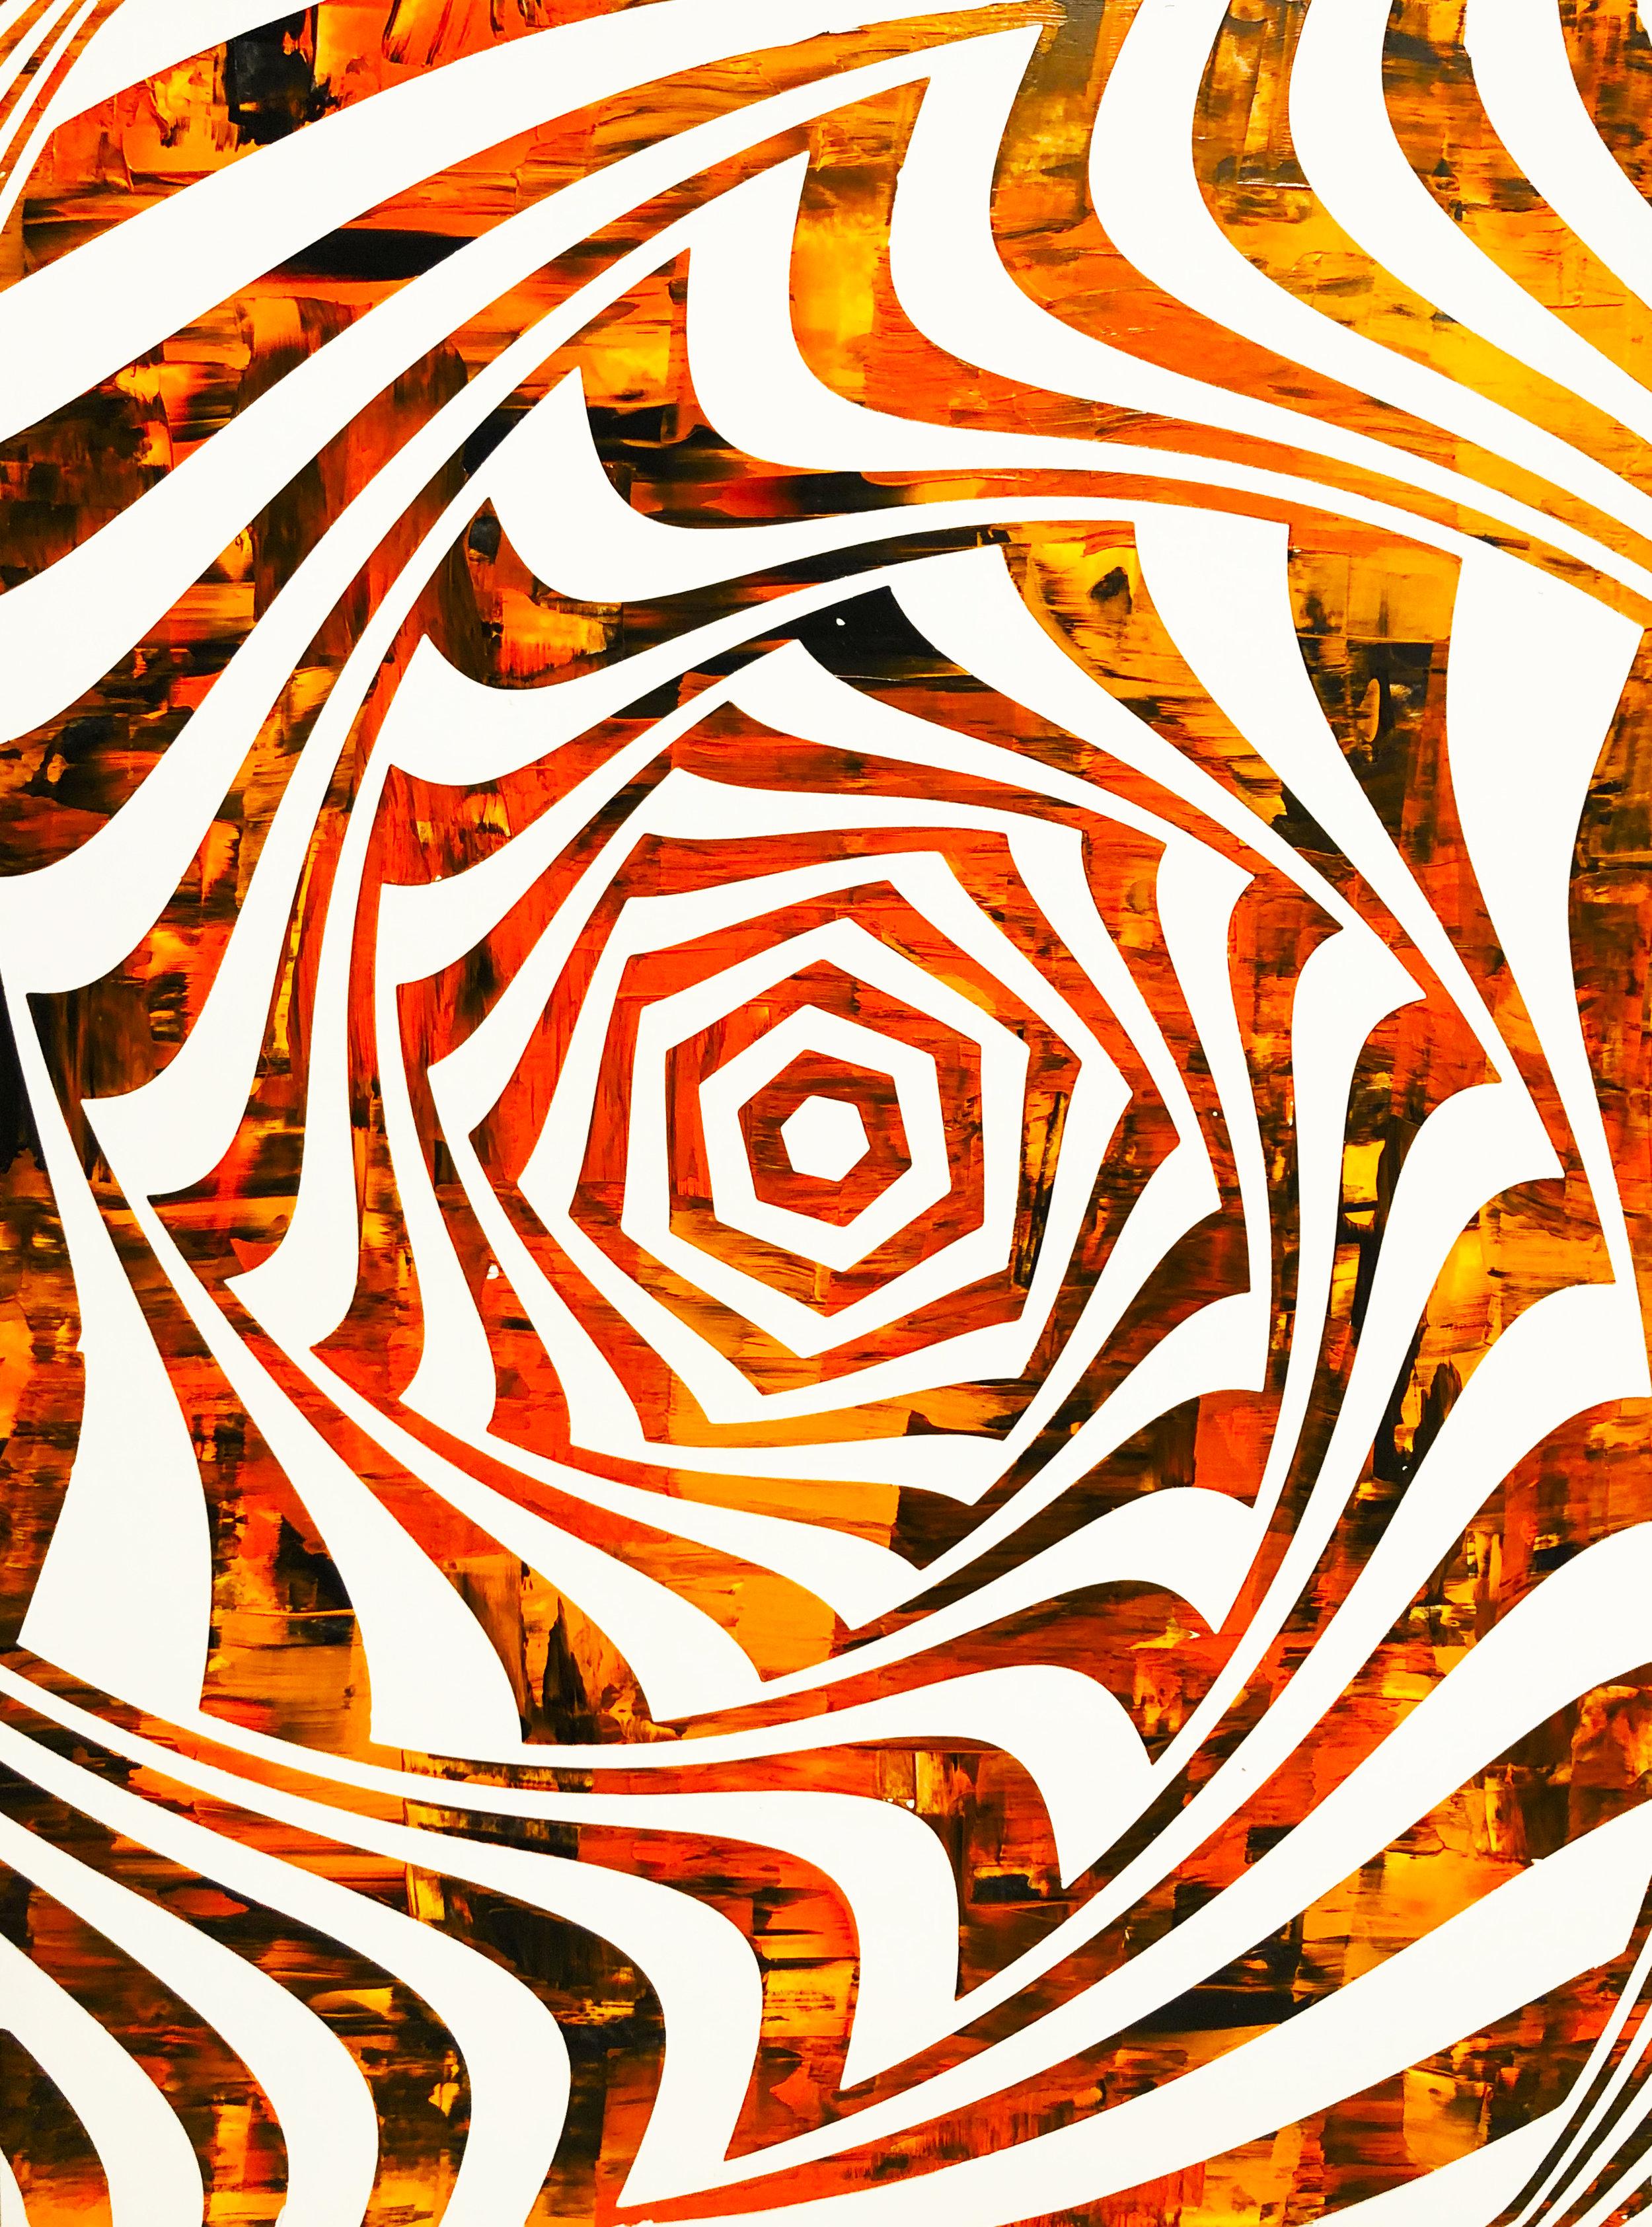 HUE Gallery of Contemporary Art - Sean Christopher Ward - The Tiger Vortex - Acrylic on MDF - 12x16 - 2018 - $375.JPG